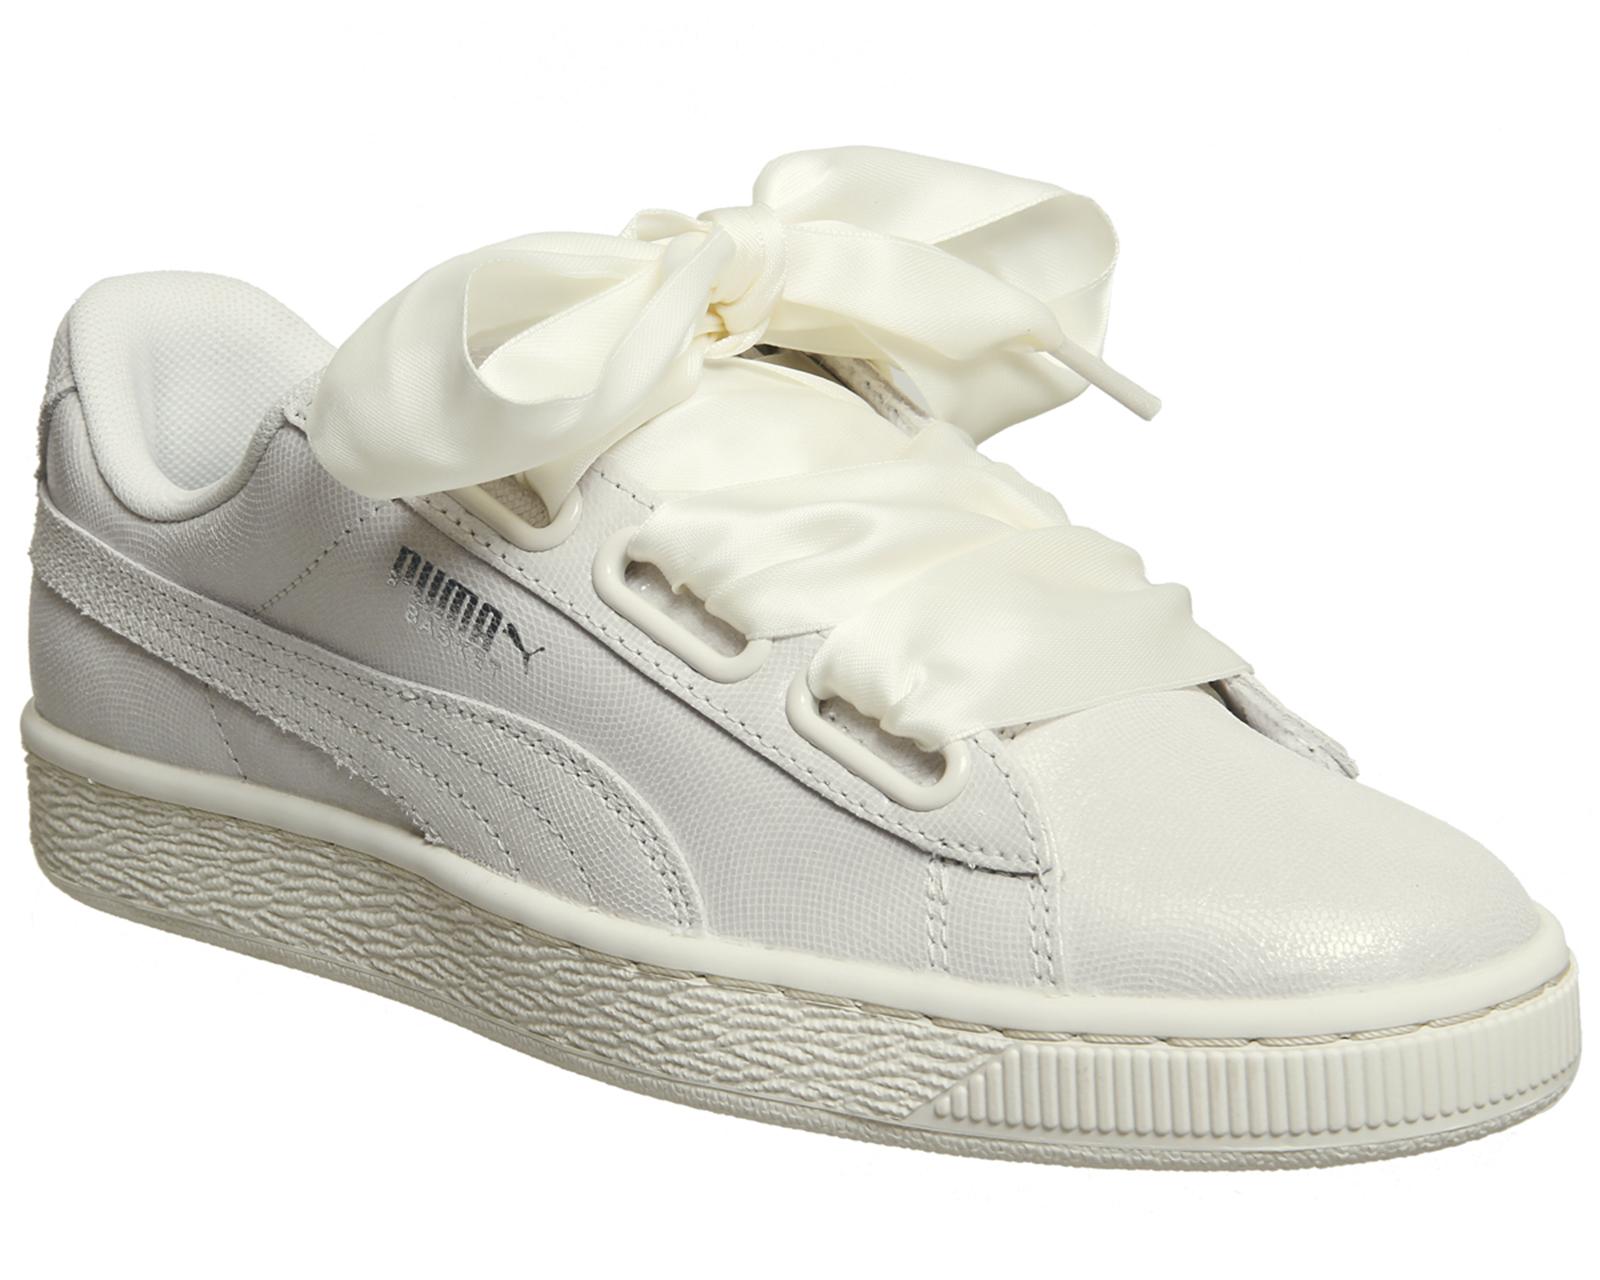 White Shoes Shine Womens Ebay Trainers Heart Puma Basket qwYI4v